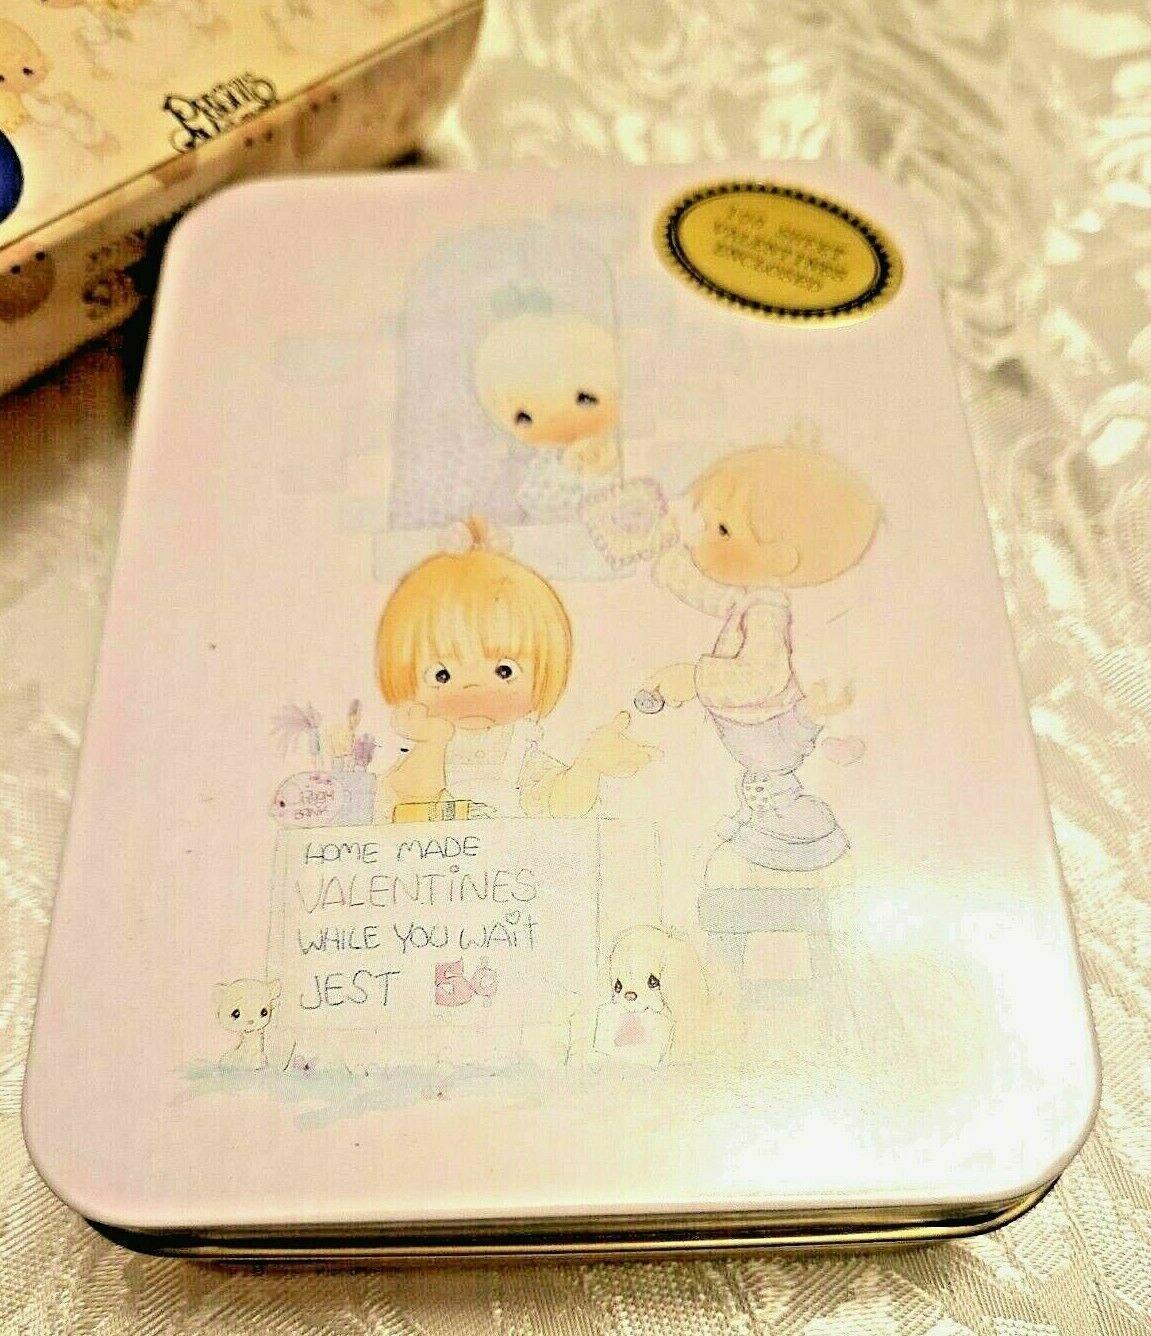 "Precious Moments Blank Note Card Valentines From the Heart"" & Keepsake Tin Box"